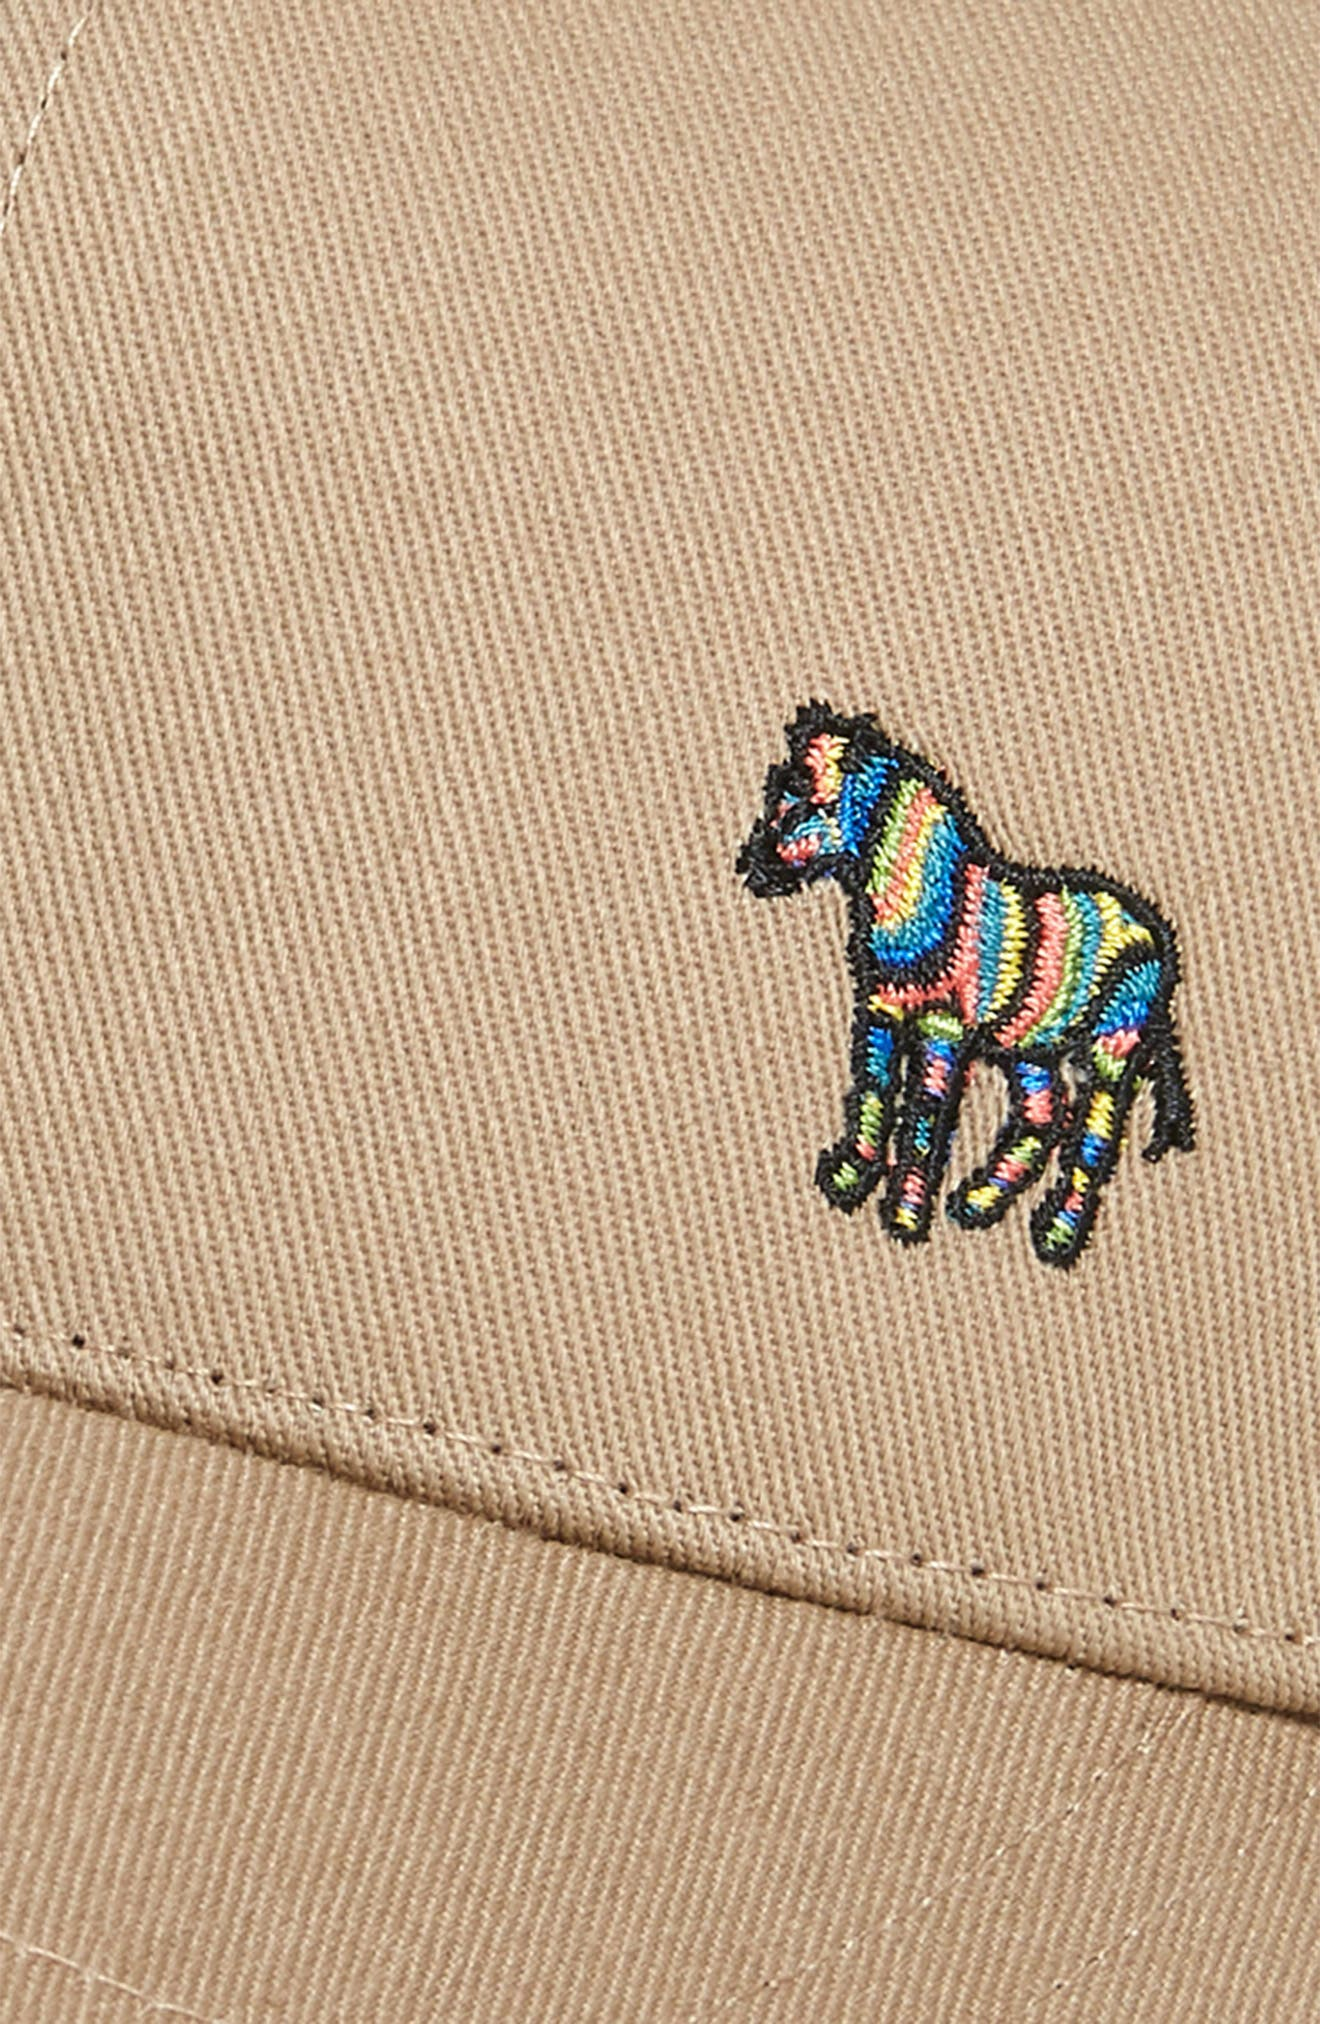 PAUL SMITH,                             Zebra Embroidered Baseball Cap,                             Alternate thumbnail 3, color,                             TAN